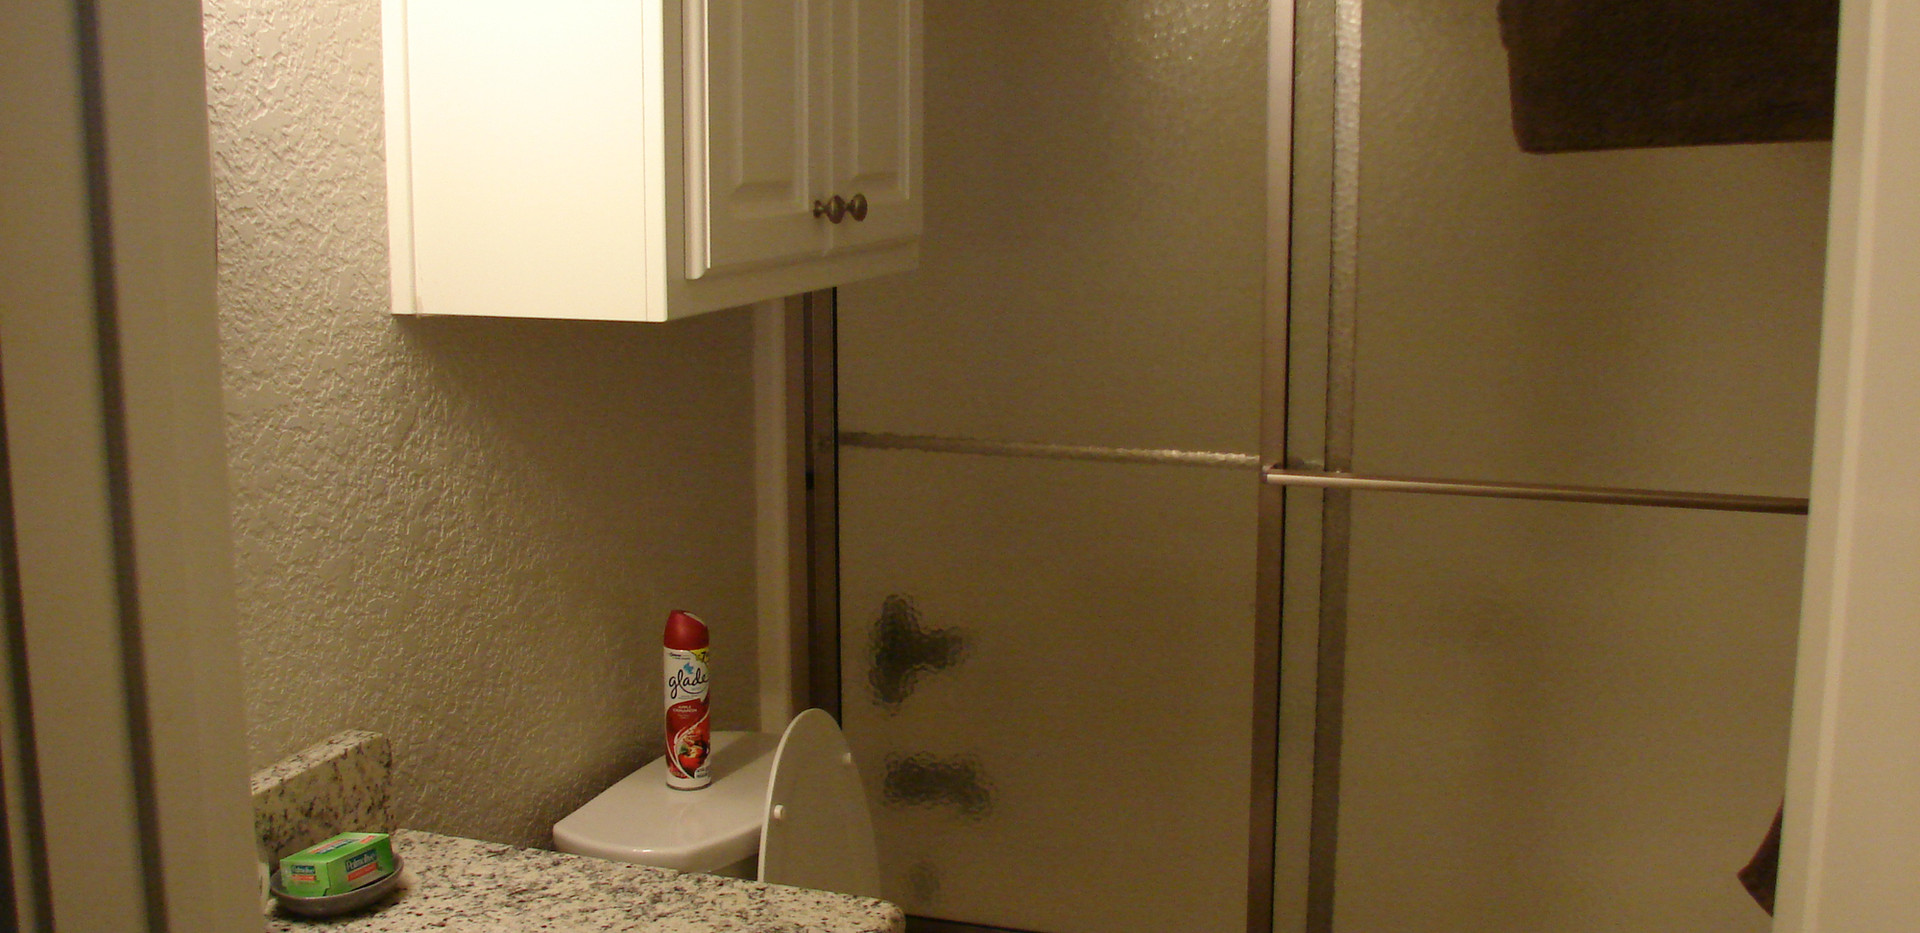 Small cabin bathroom 1.JPG